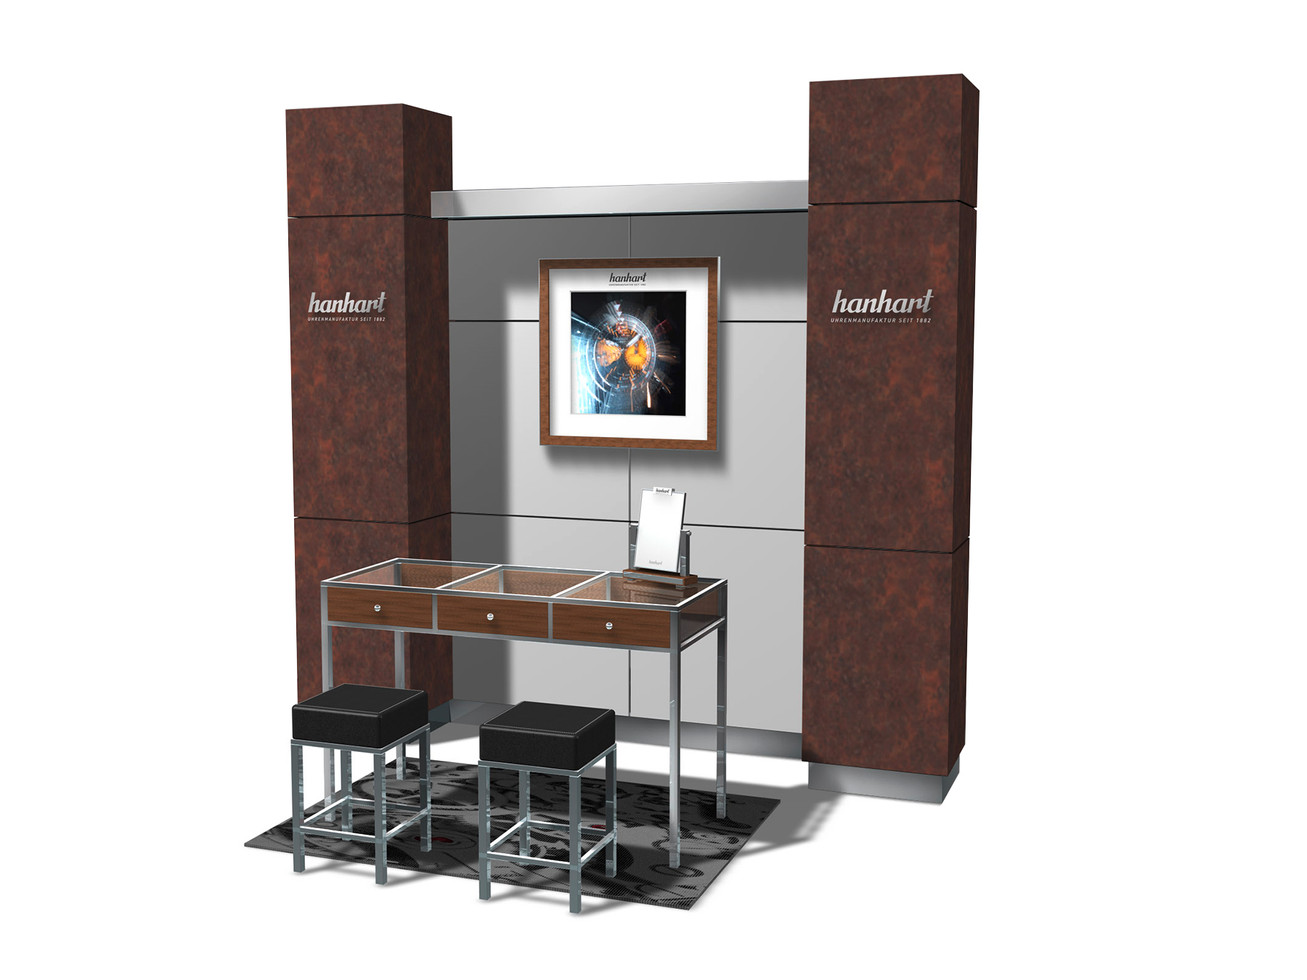 Corner concept - Backwall & Sales showcase + stools